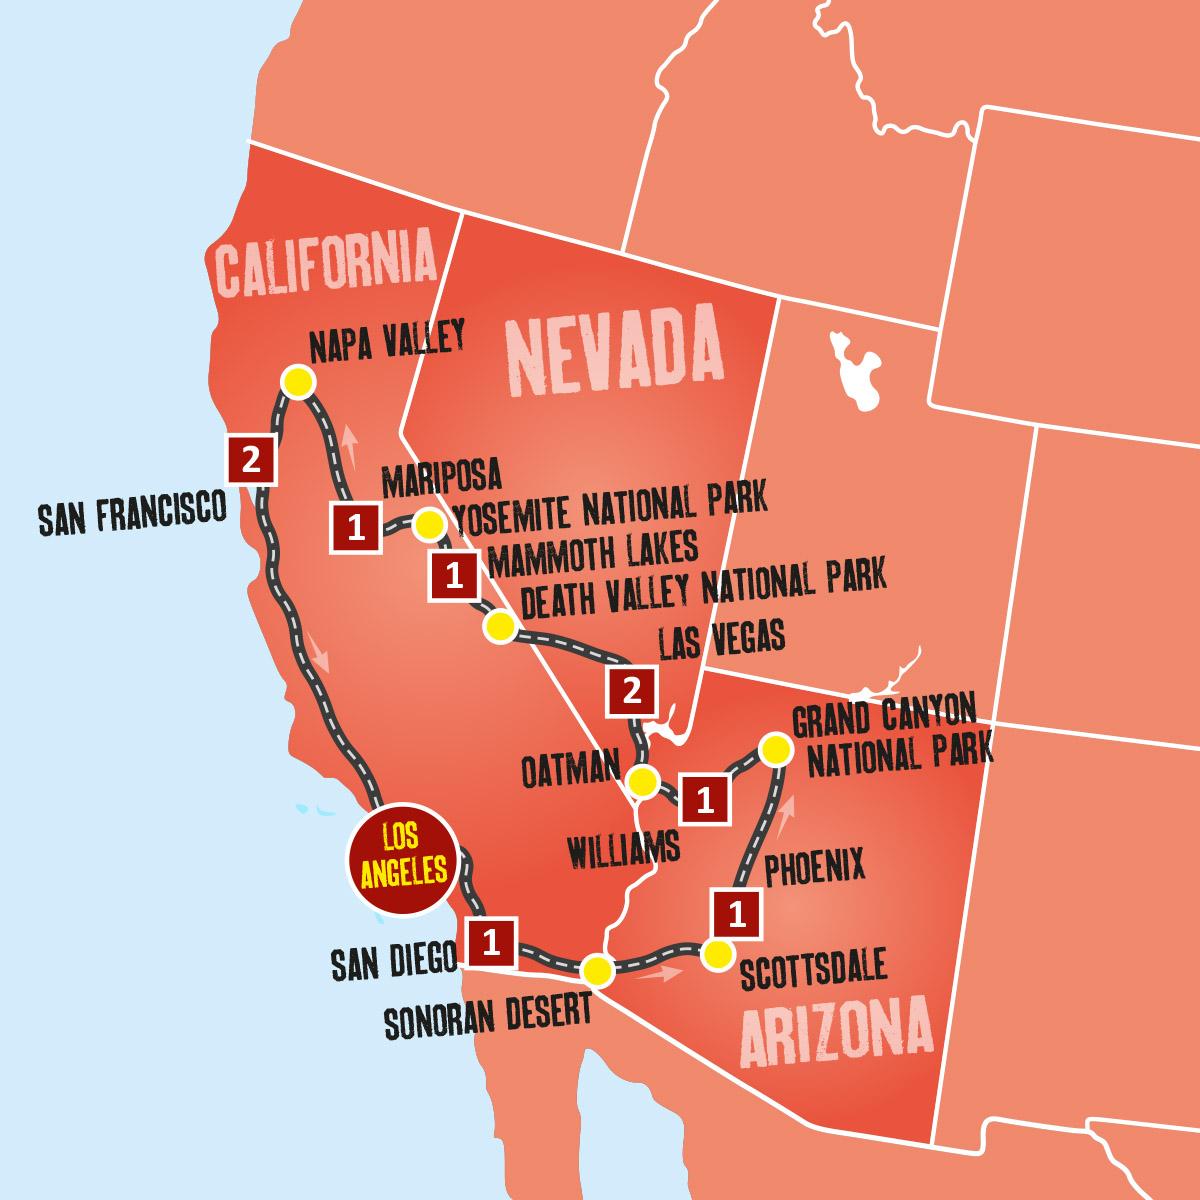 US Holidays West Coast Coach Tours Expat Explore Travel 1200x1200